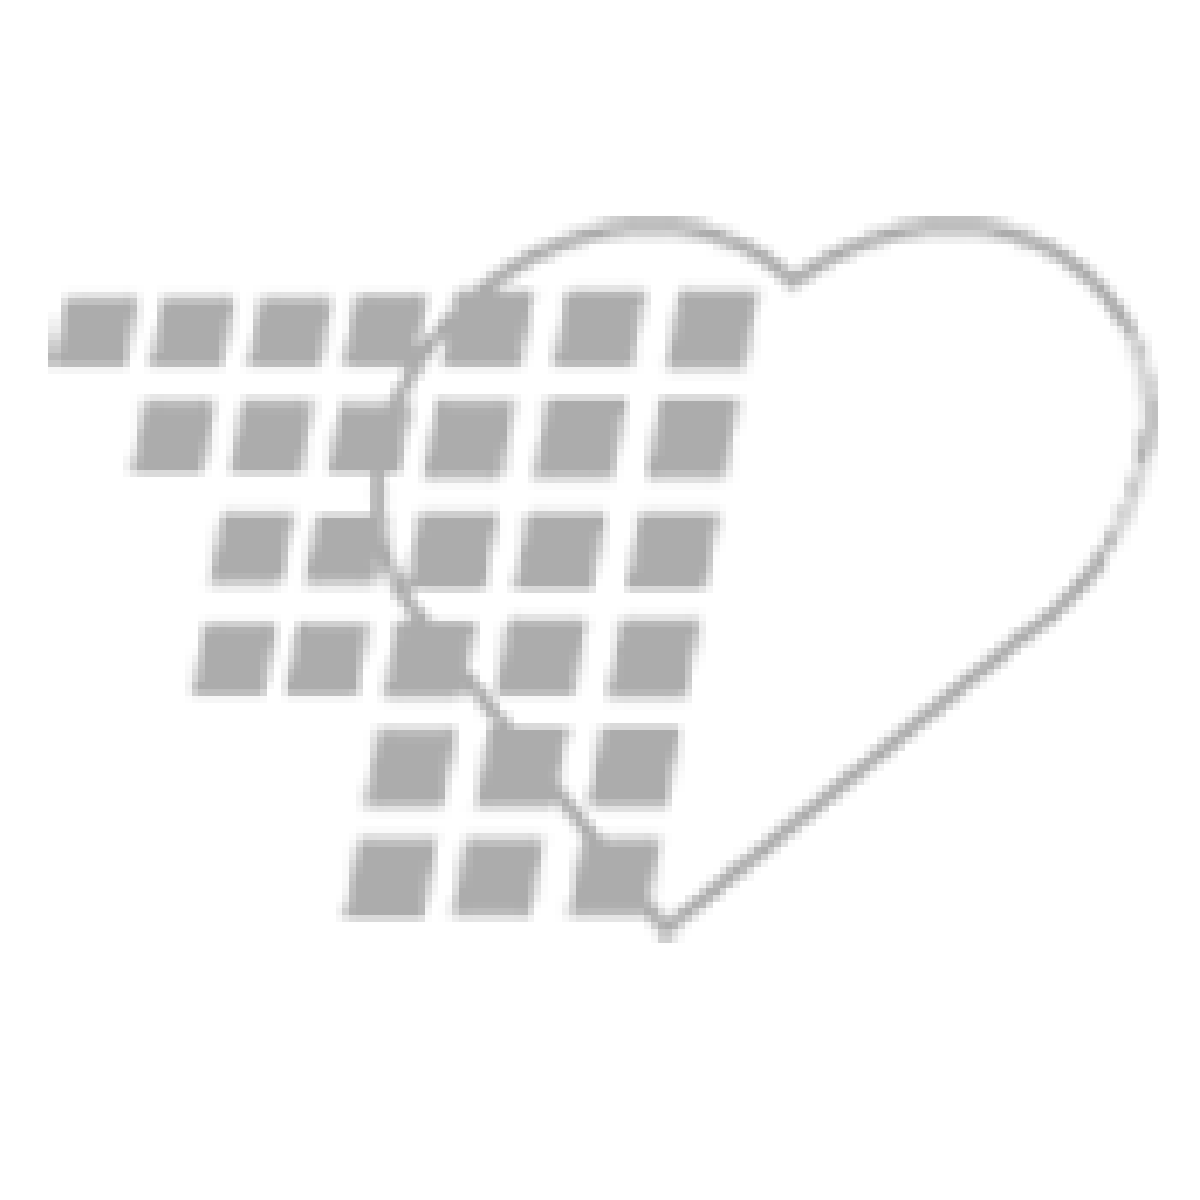 06-59-6500 - BD   PosiFlush   Pre-Filled Normal Saline Syringe - 10 mL Fill in 10 mL Syringe